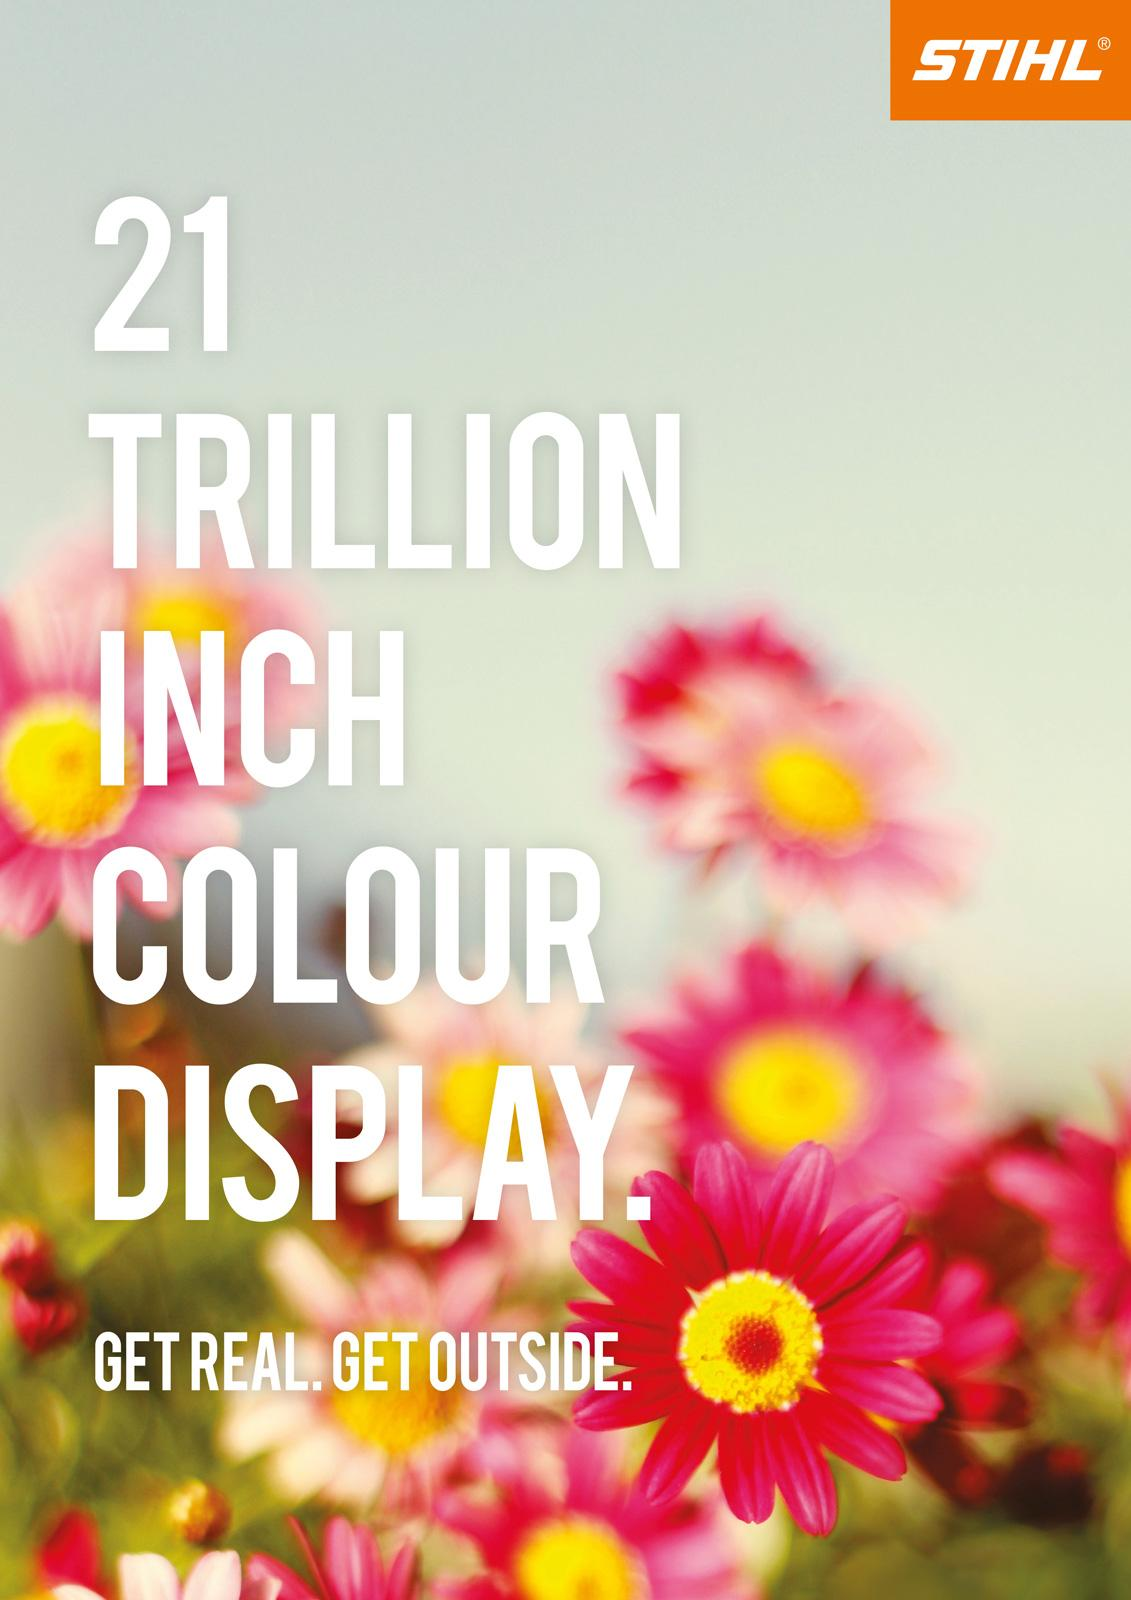 Stihl Print Ad -  21 Trillion Inch